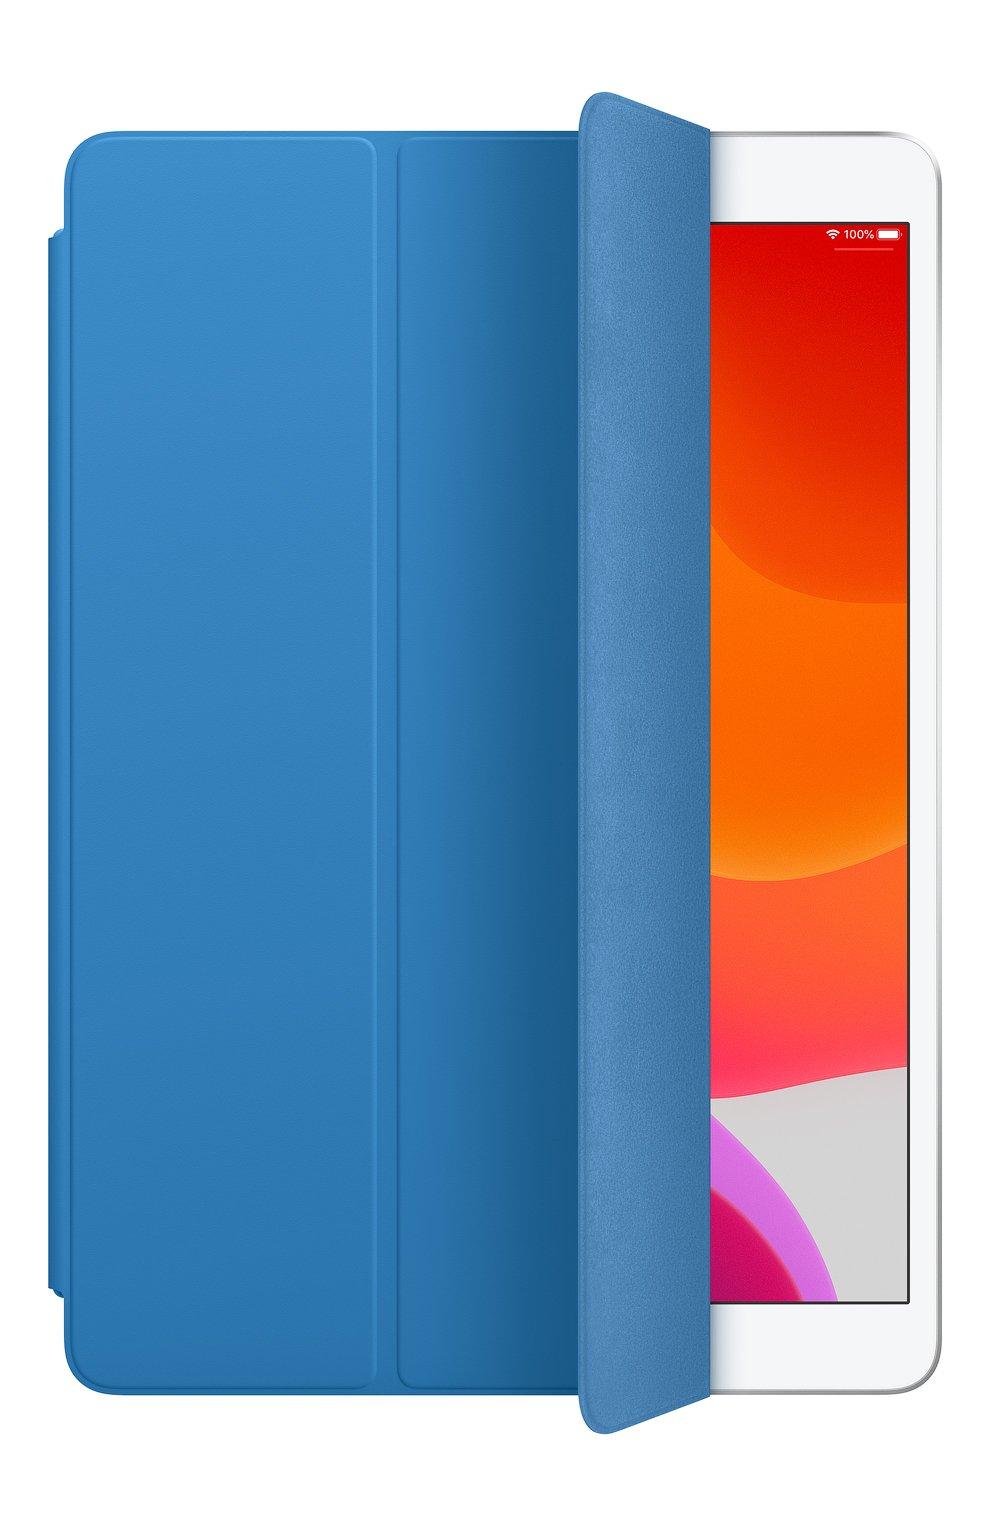 Мужской чехол smart cover для ipad (7th gen)/ipad air (3rd gen) APPLE  синего цвета, арт. MXTF2ZM/A   Фото 2